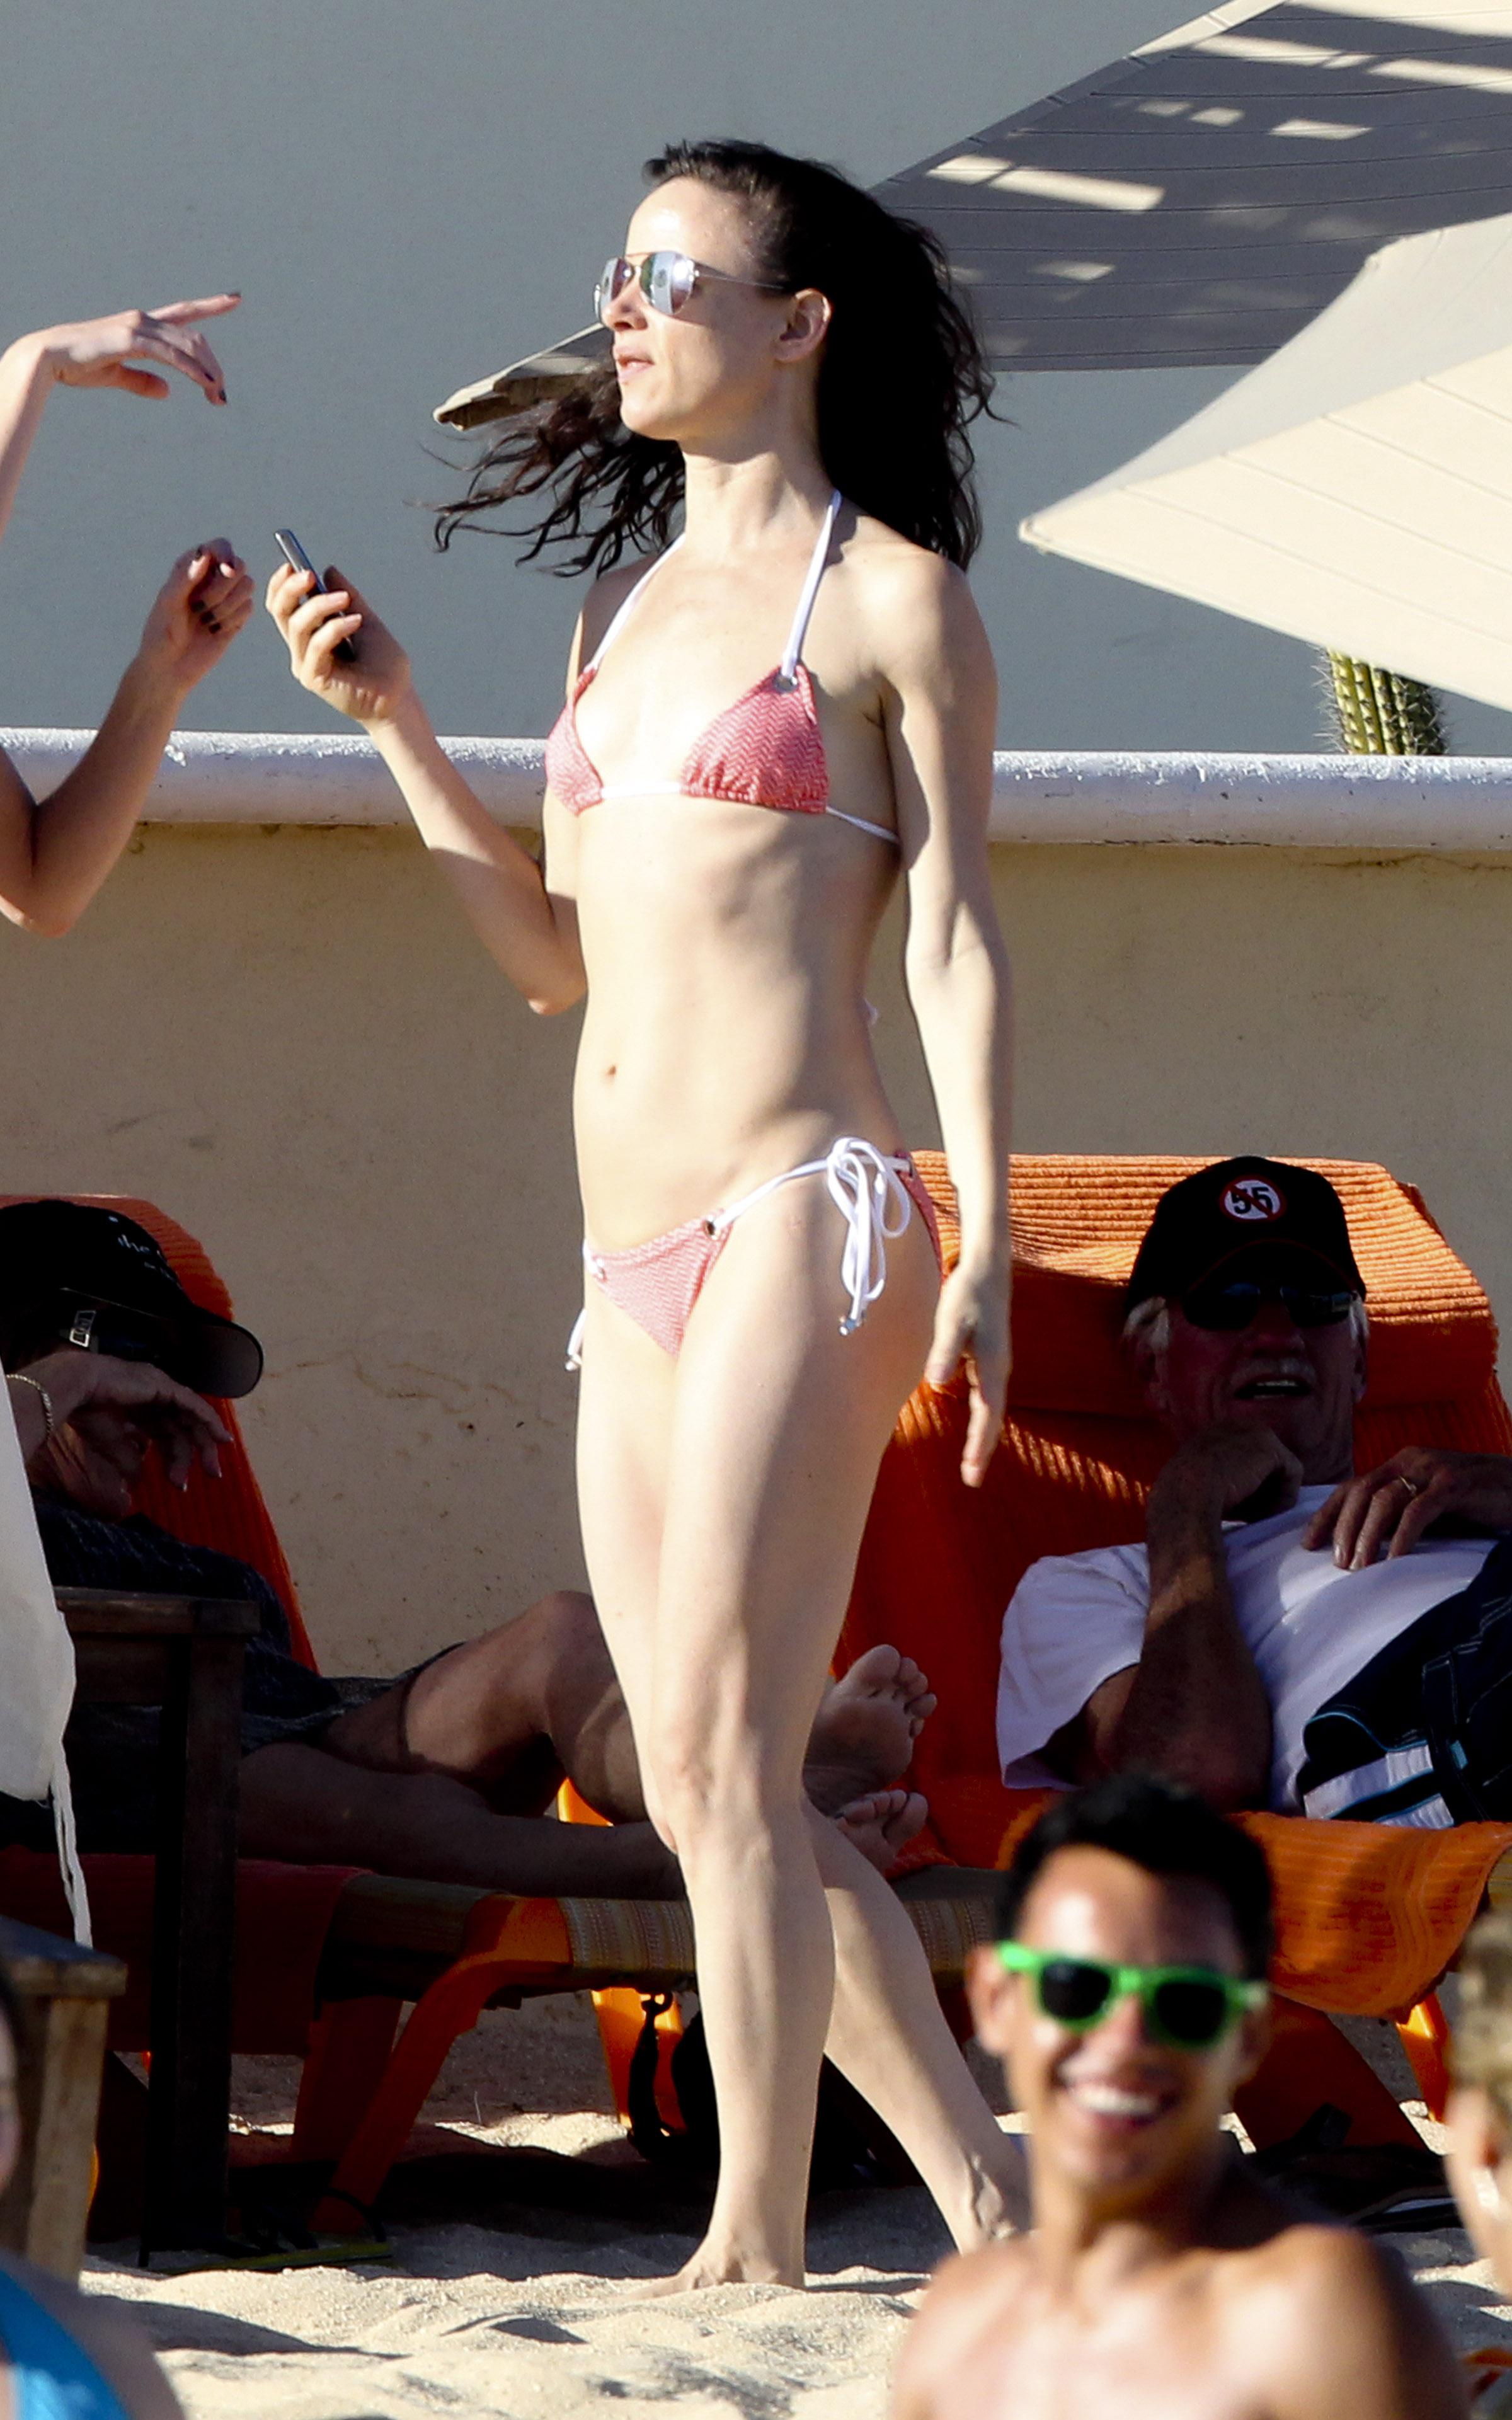 juliette lewis bikini butts celebs and amateurs